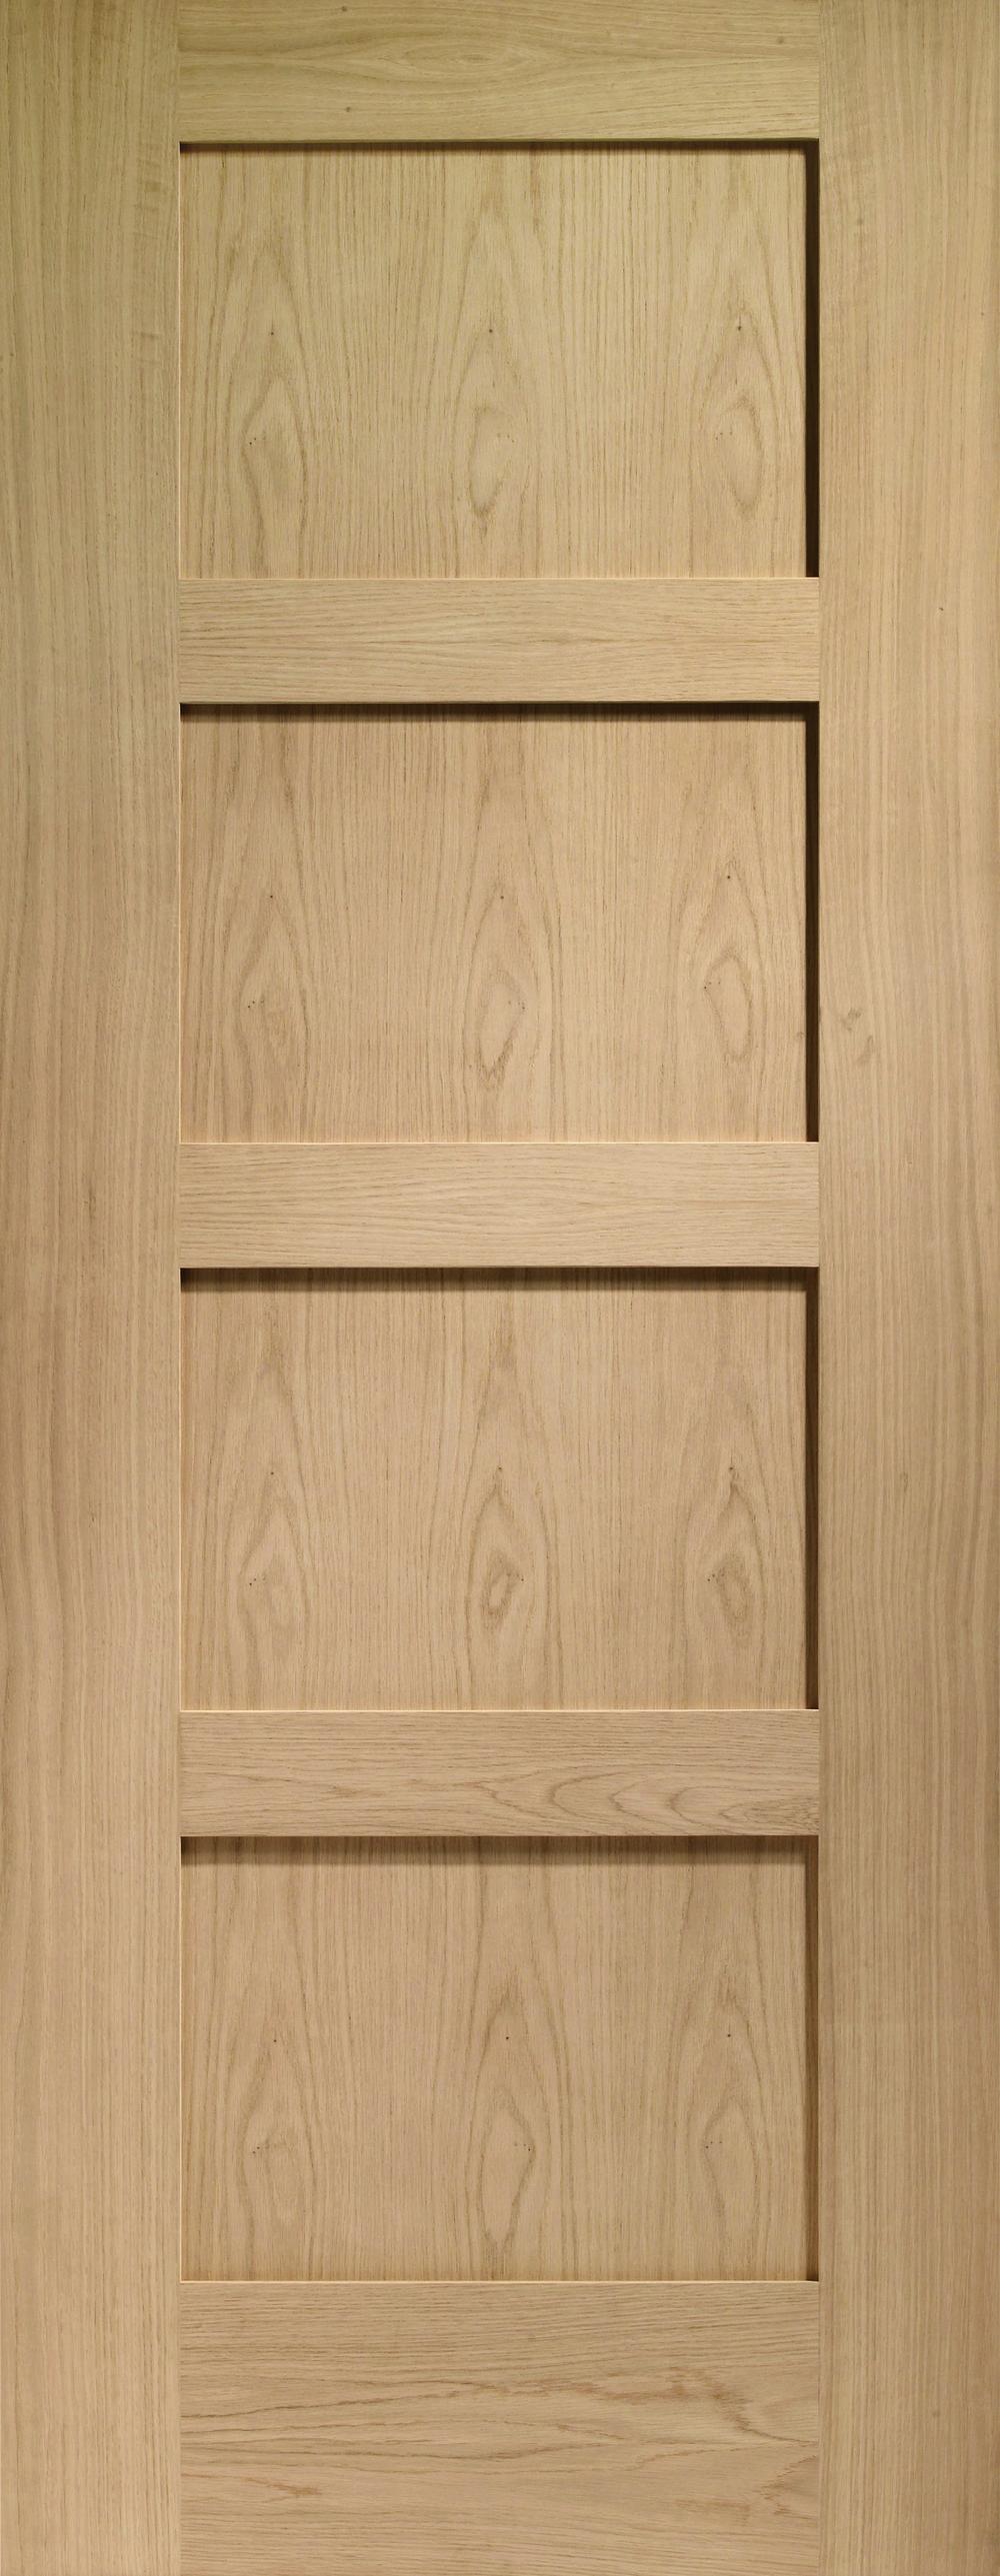 Oak Shaker 4 Panel.jpg